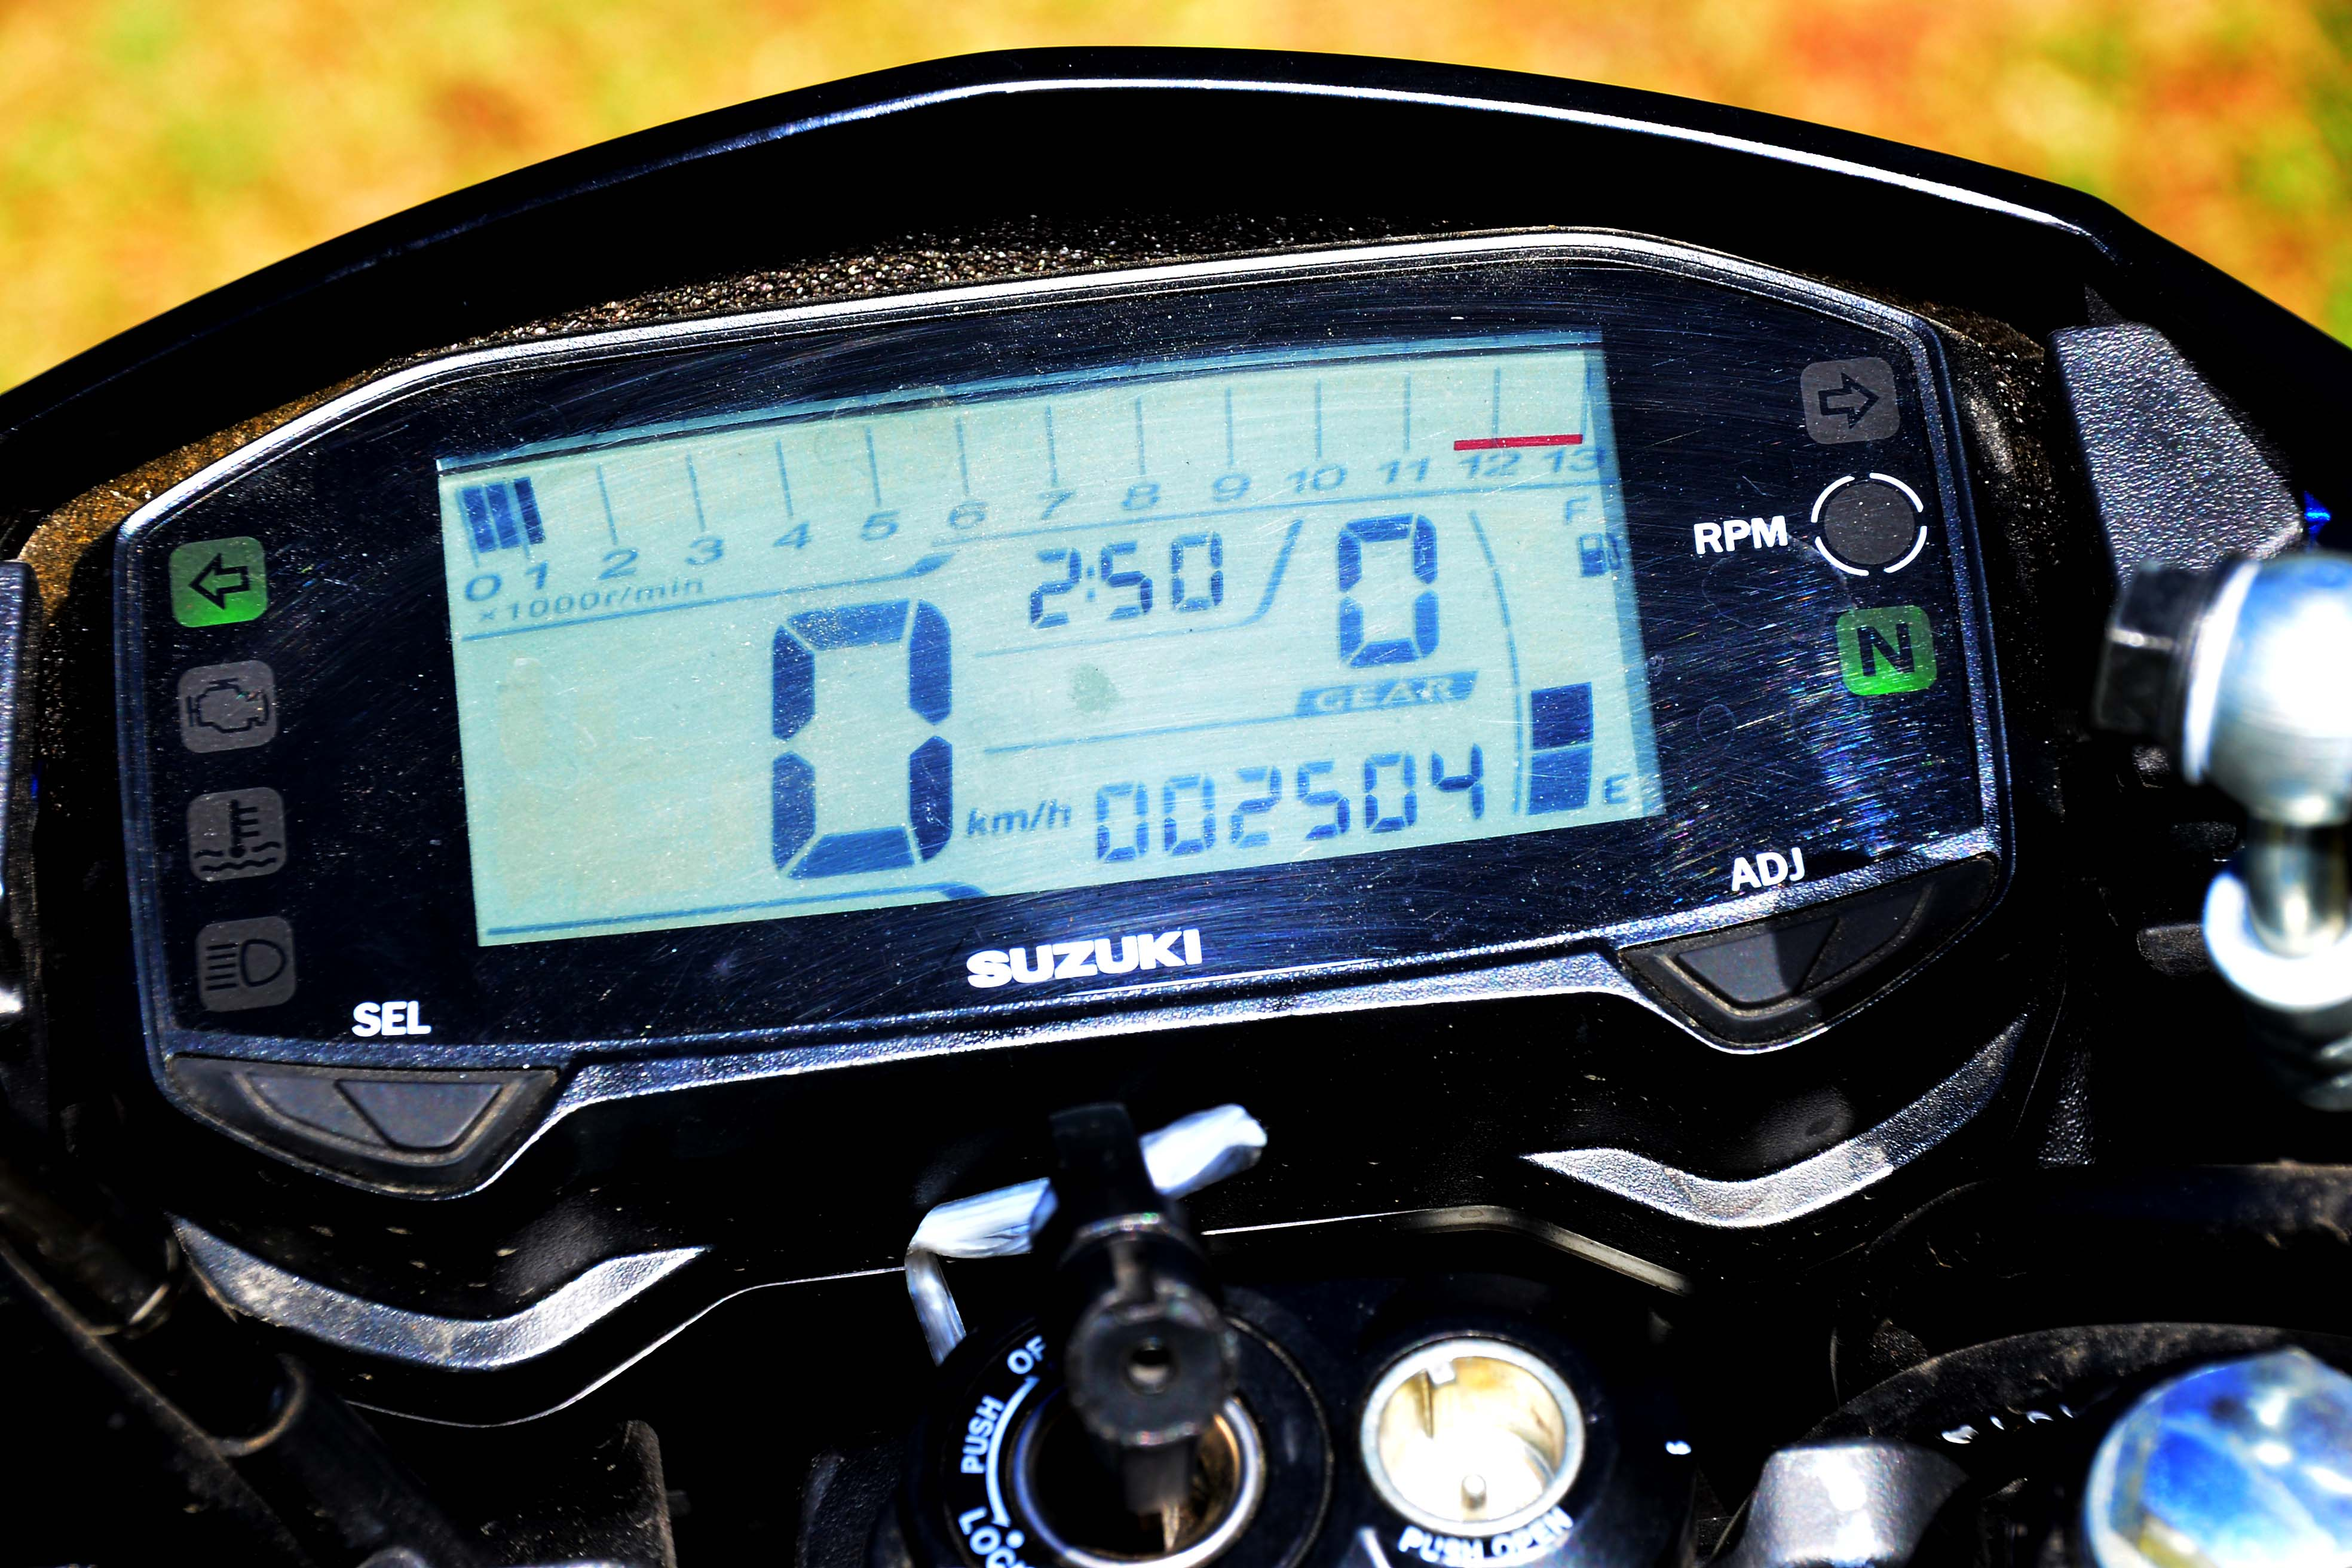 SUZUKI RAIDER R150 FI | Inside Racing